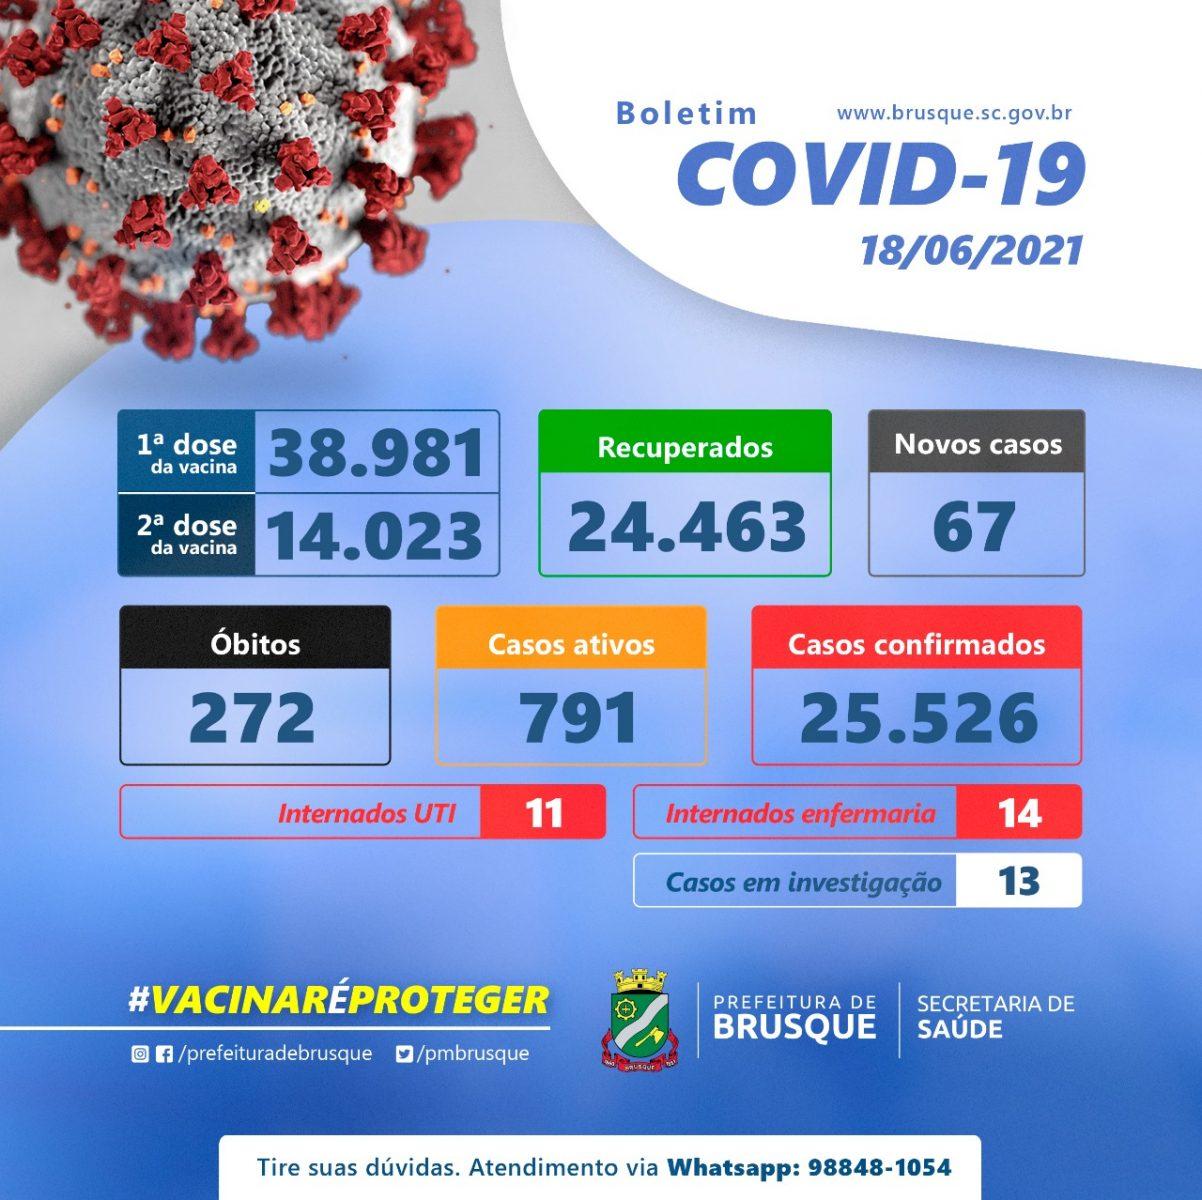 Covid-19: Confira o boletim epidemiológico desta sexta-feira (18)